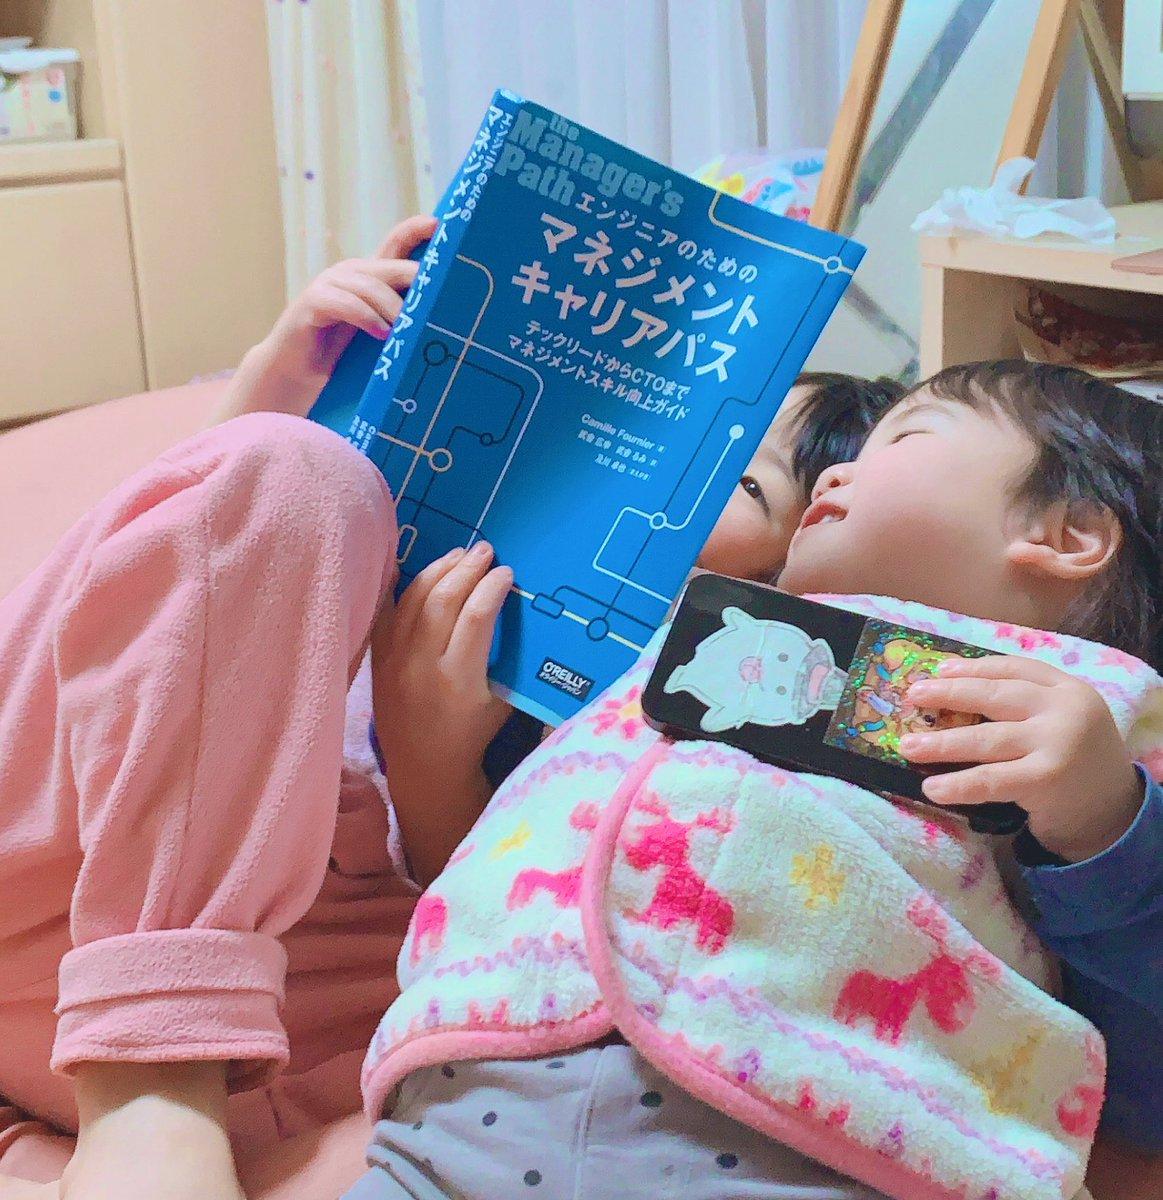 RT @kahonyun: 5歳が1歳に読み聞かせる本か? https://t.co/wpaQ43dVe9